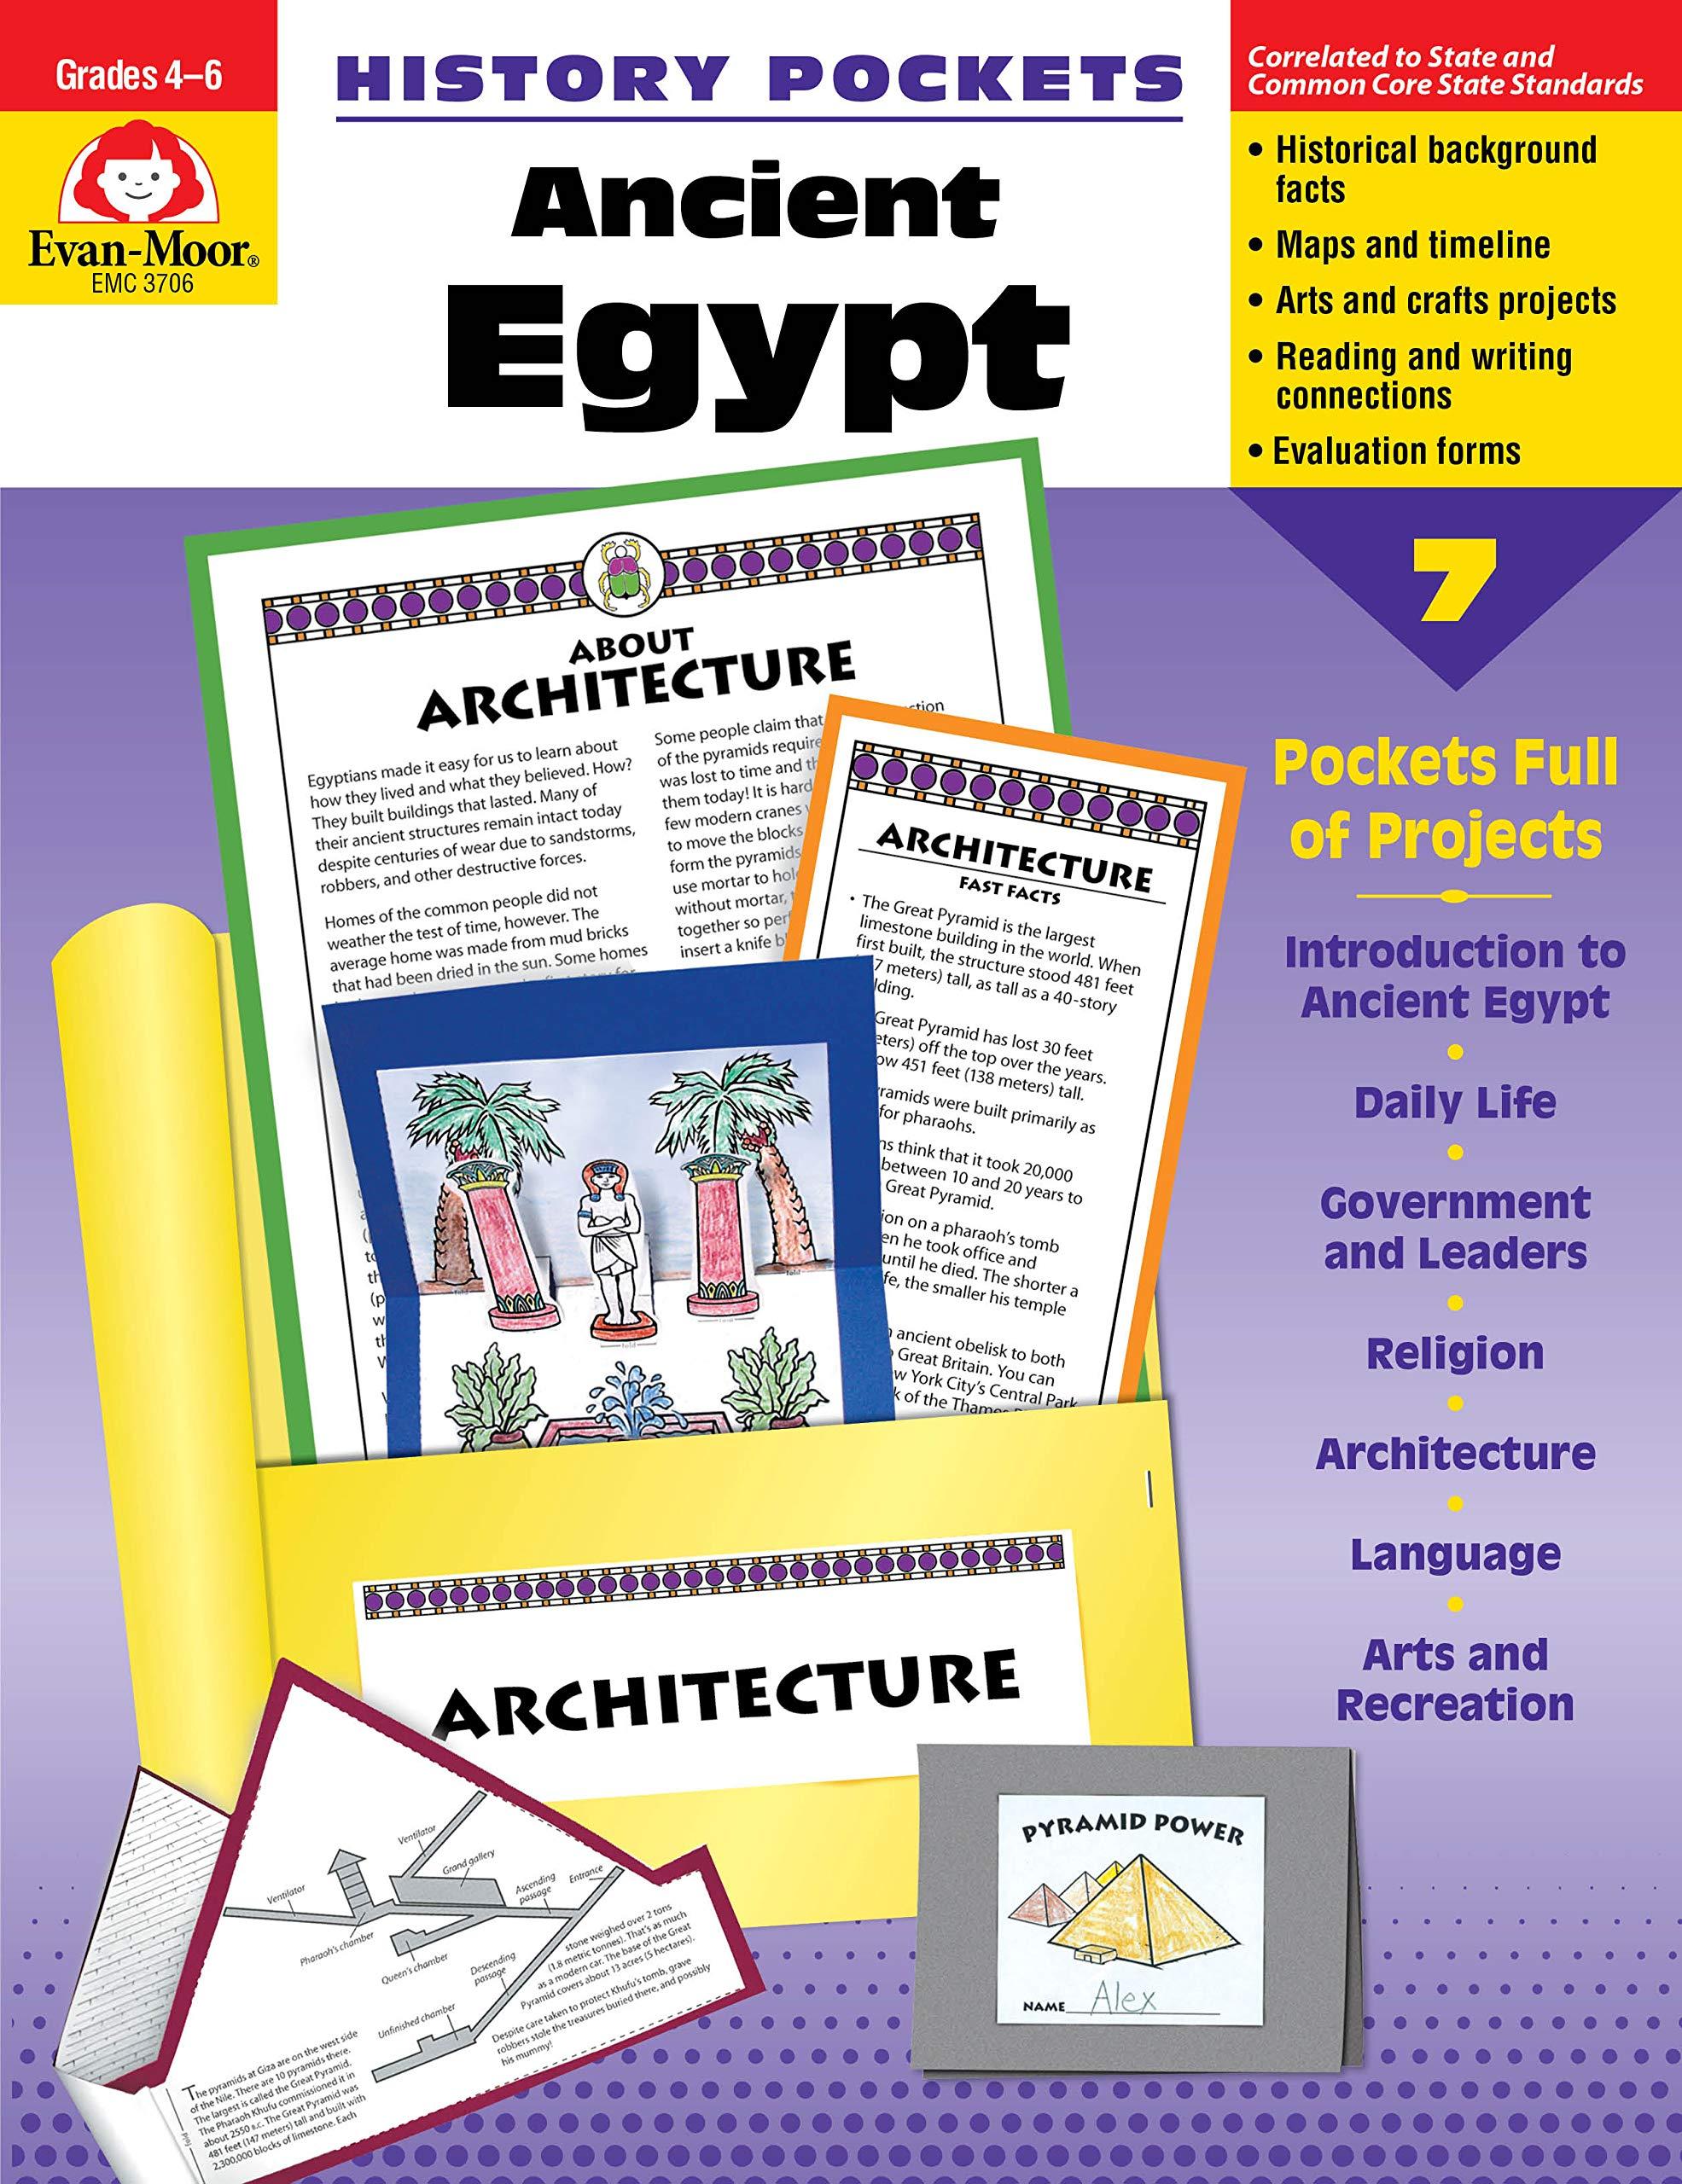 Ancient Egypt History Pocket: Grades 4-6+